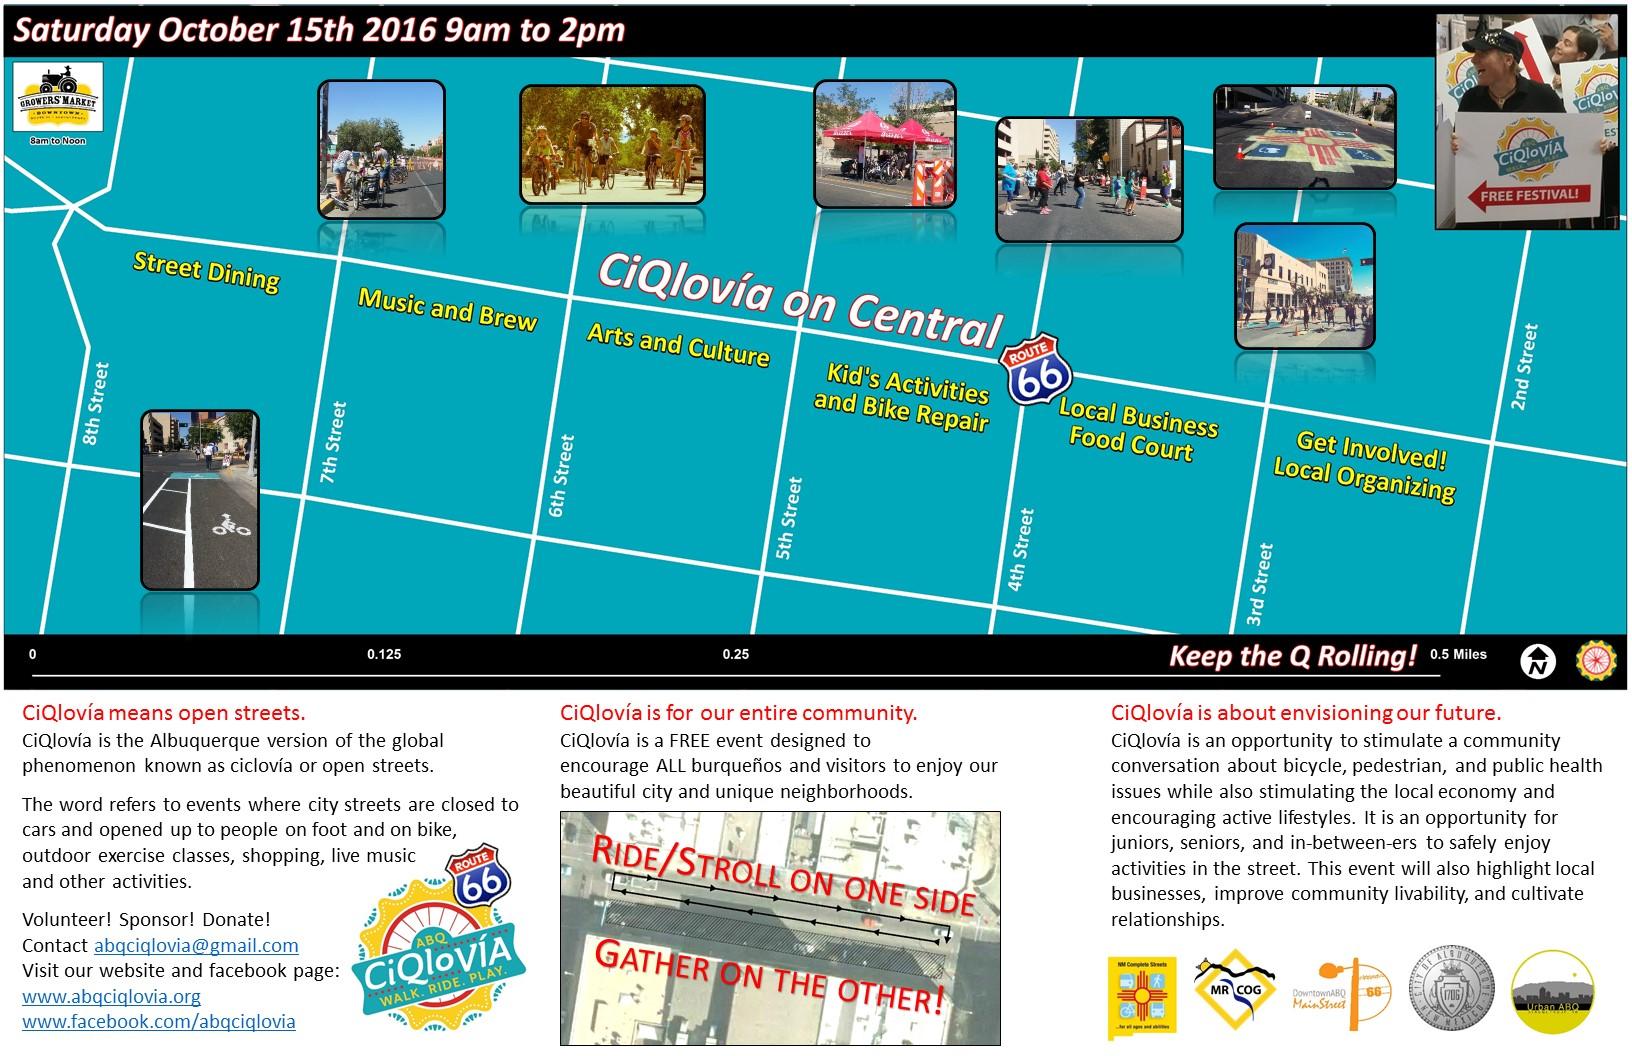 CiQlovia 2016 event